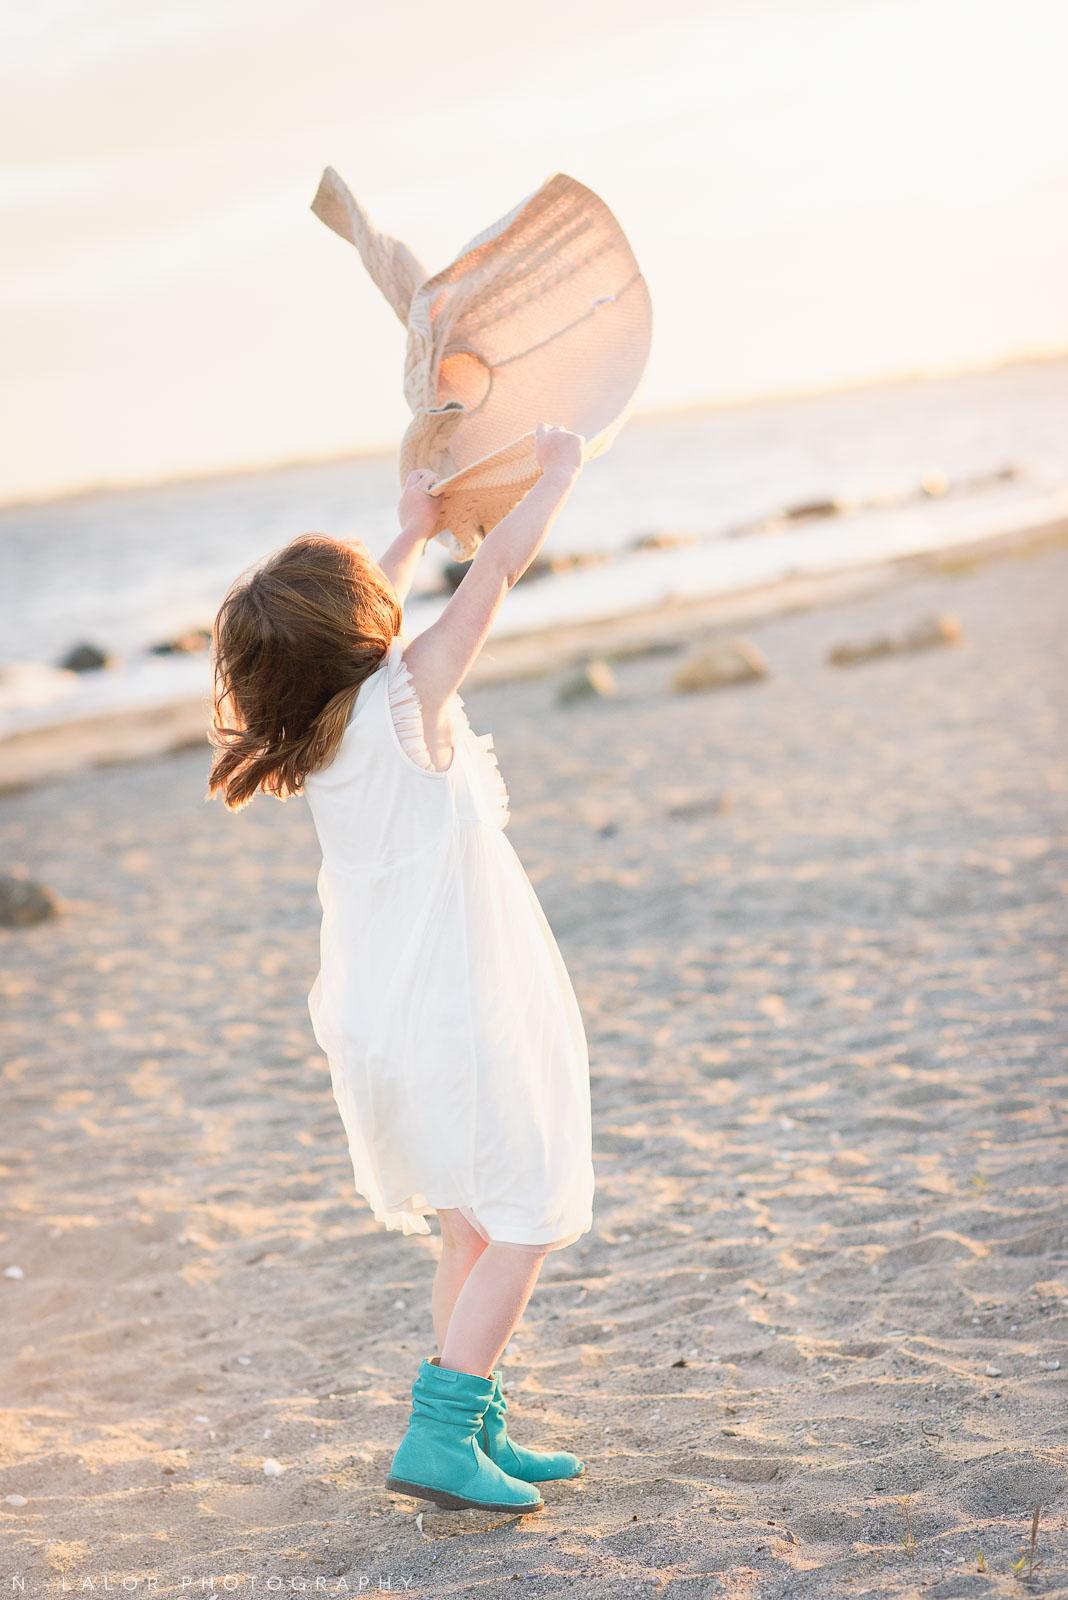 nlalor-photography-2015-10-04-gwen-beach-session-23.jpg